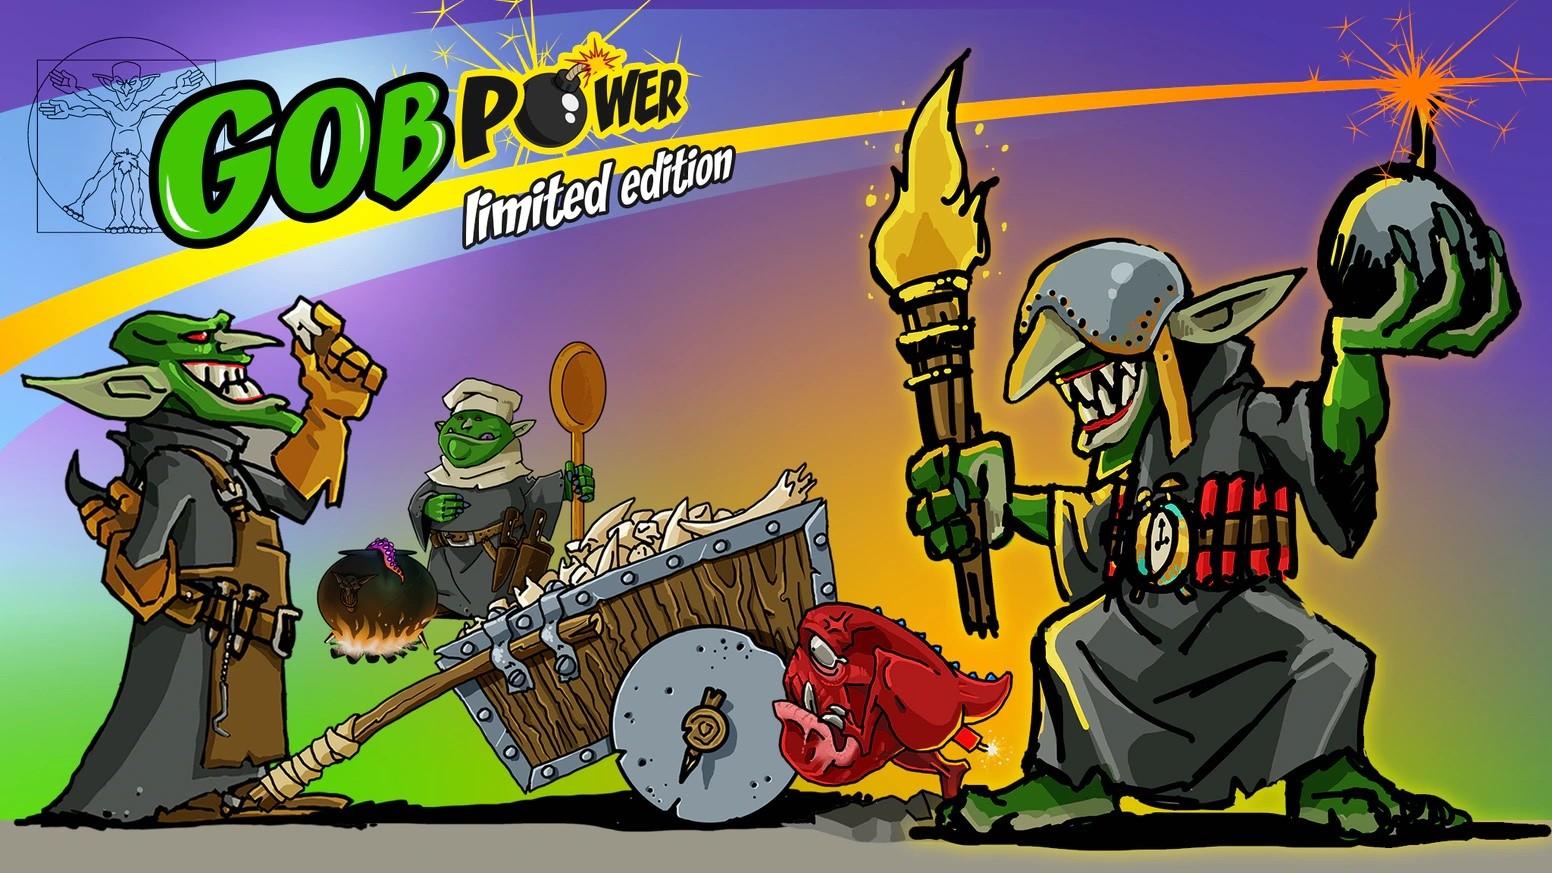 Gobs Power